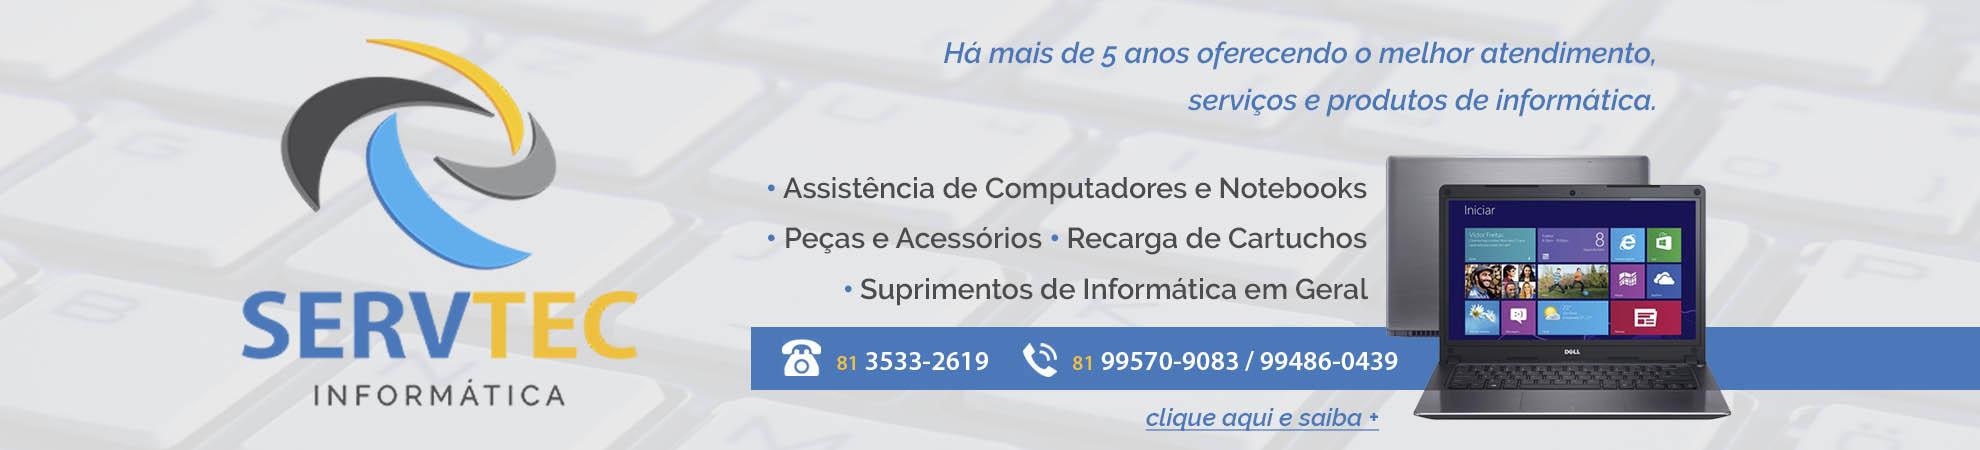 ServTec Informática